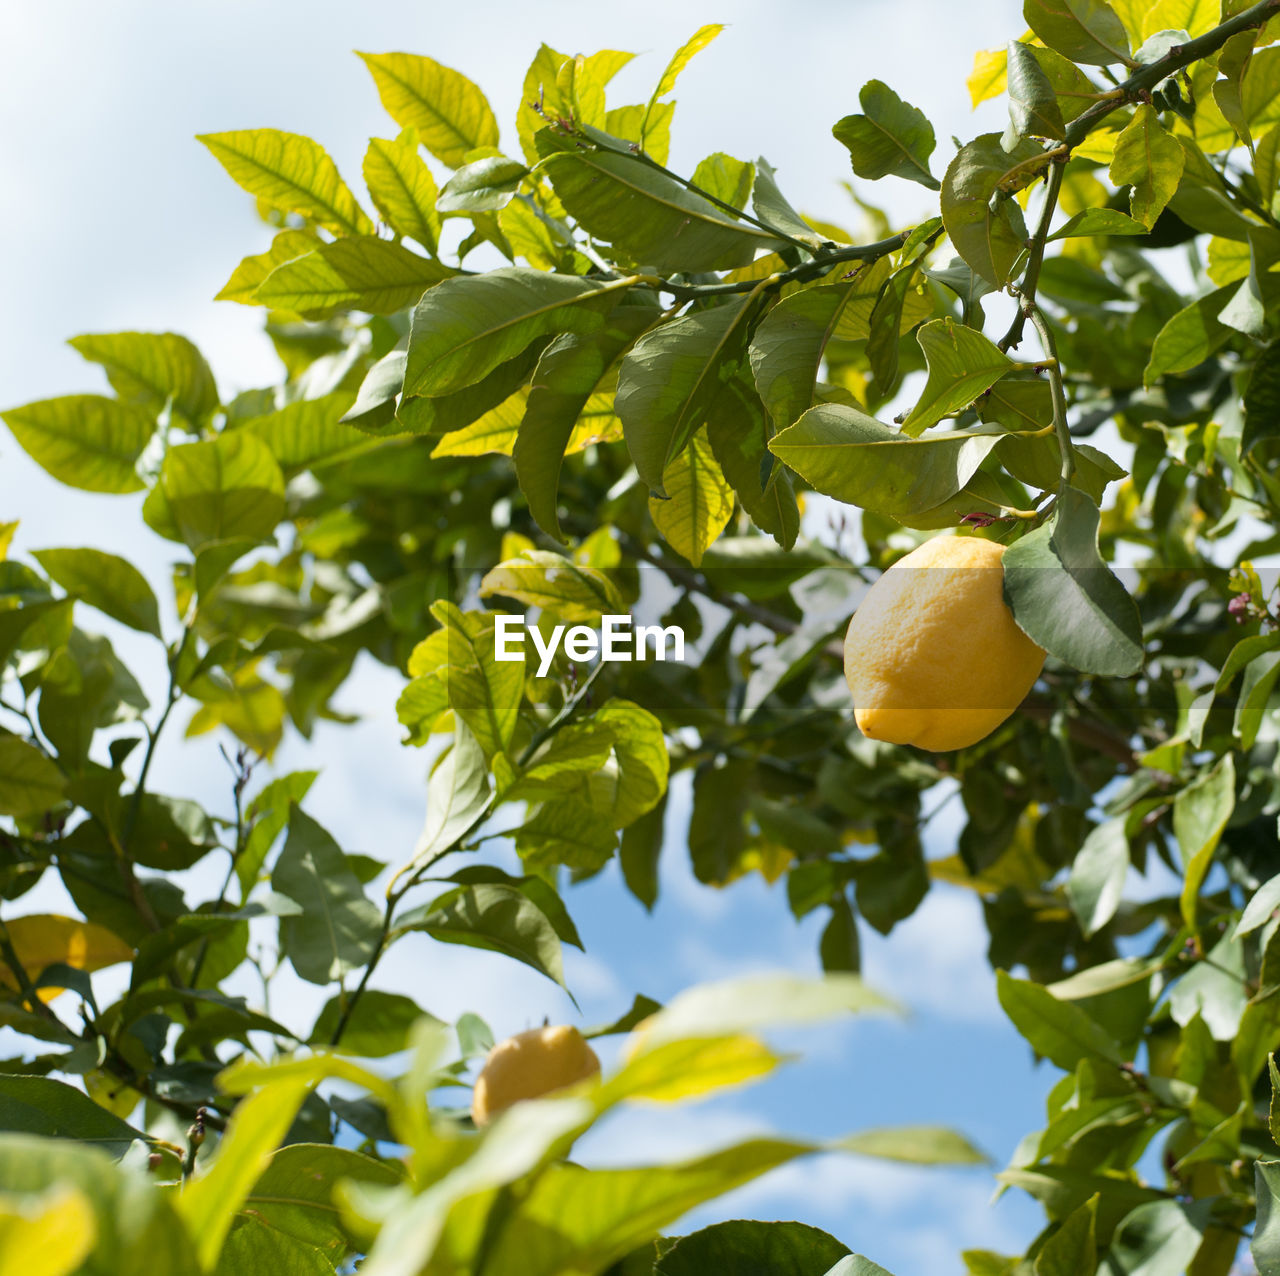 Low angle view of lemons growing on tree